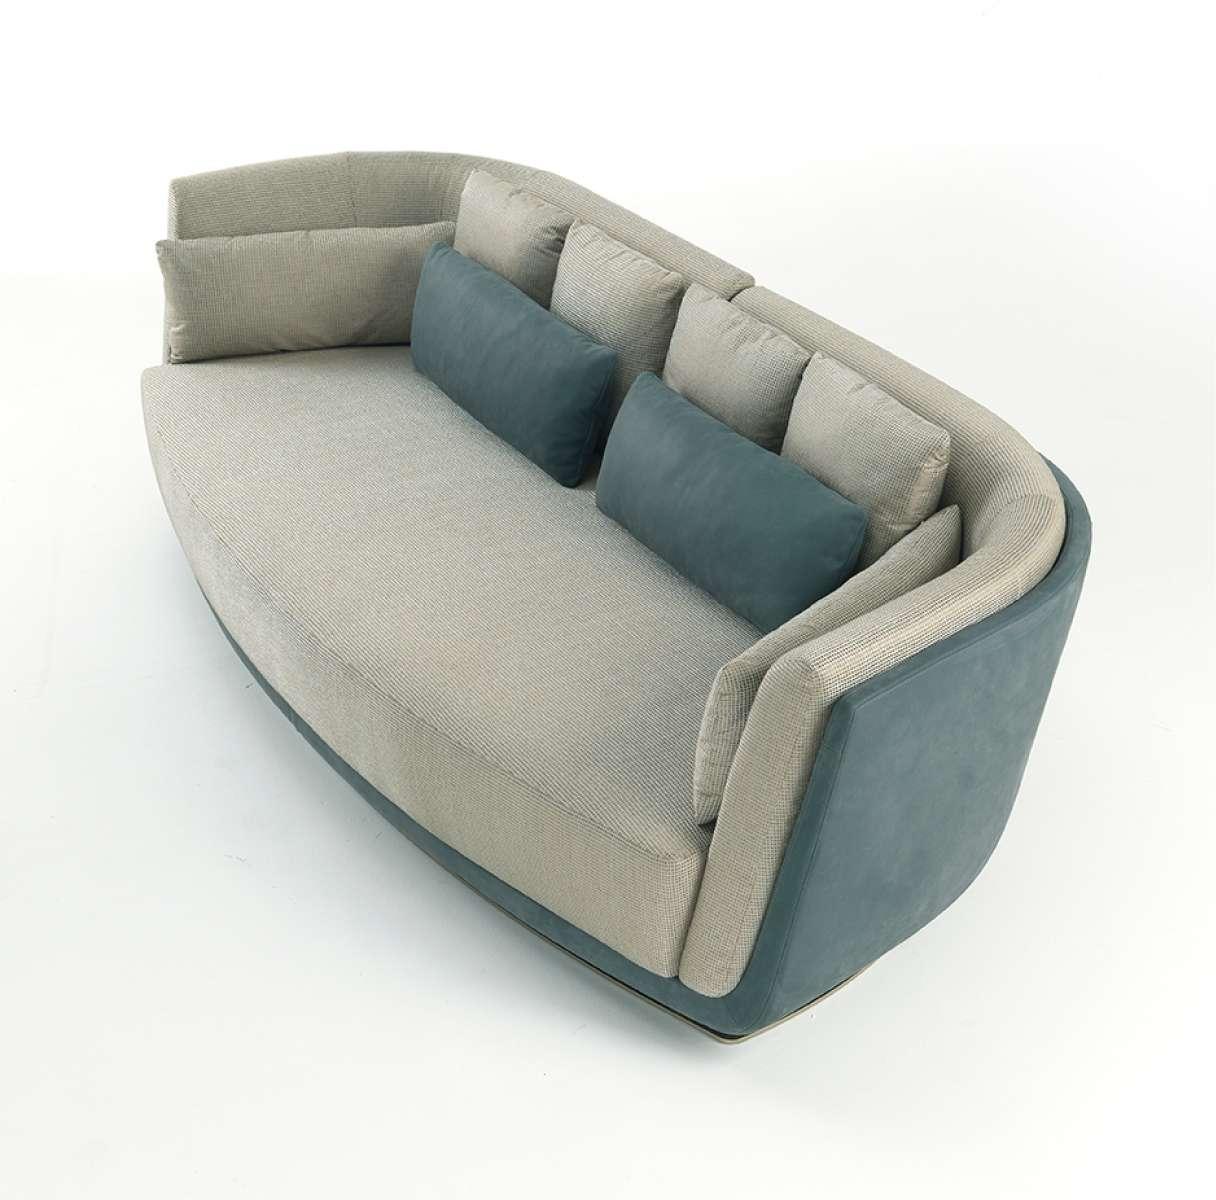 Studio Marco Piva – Product design – 414